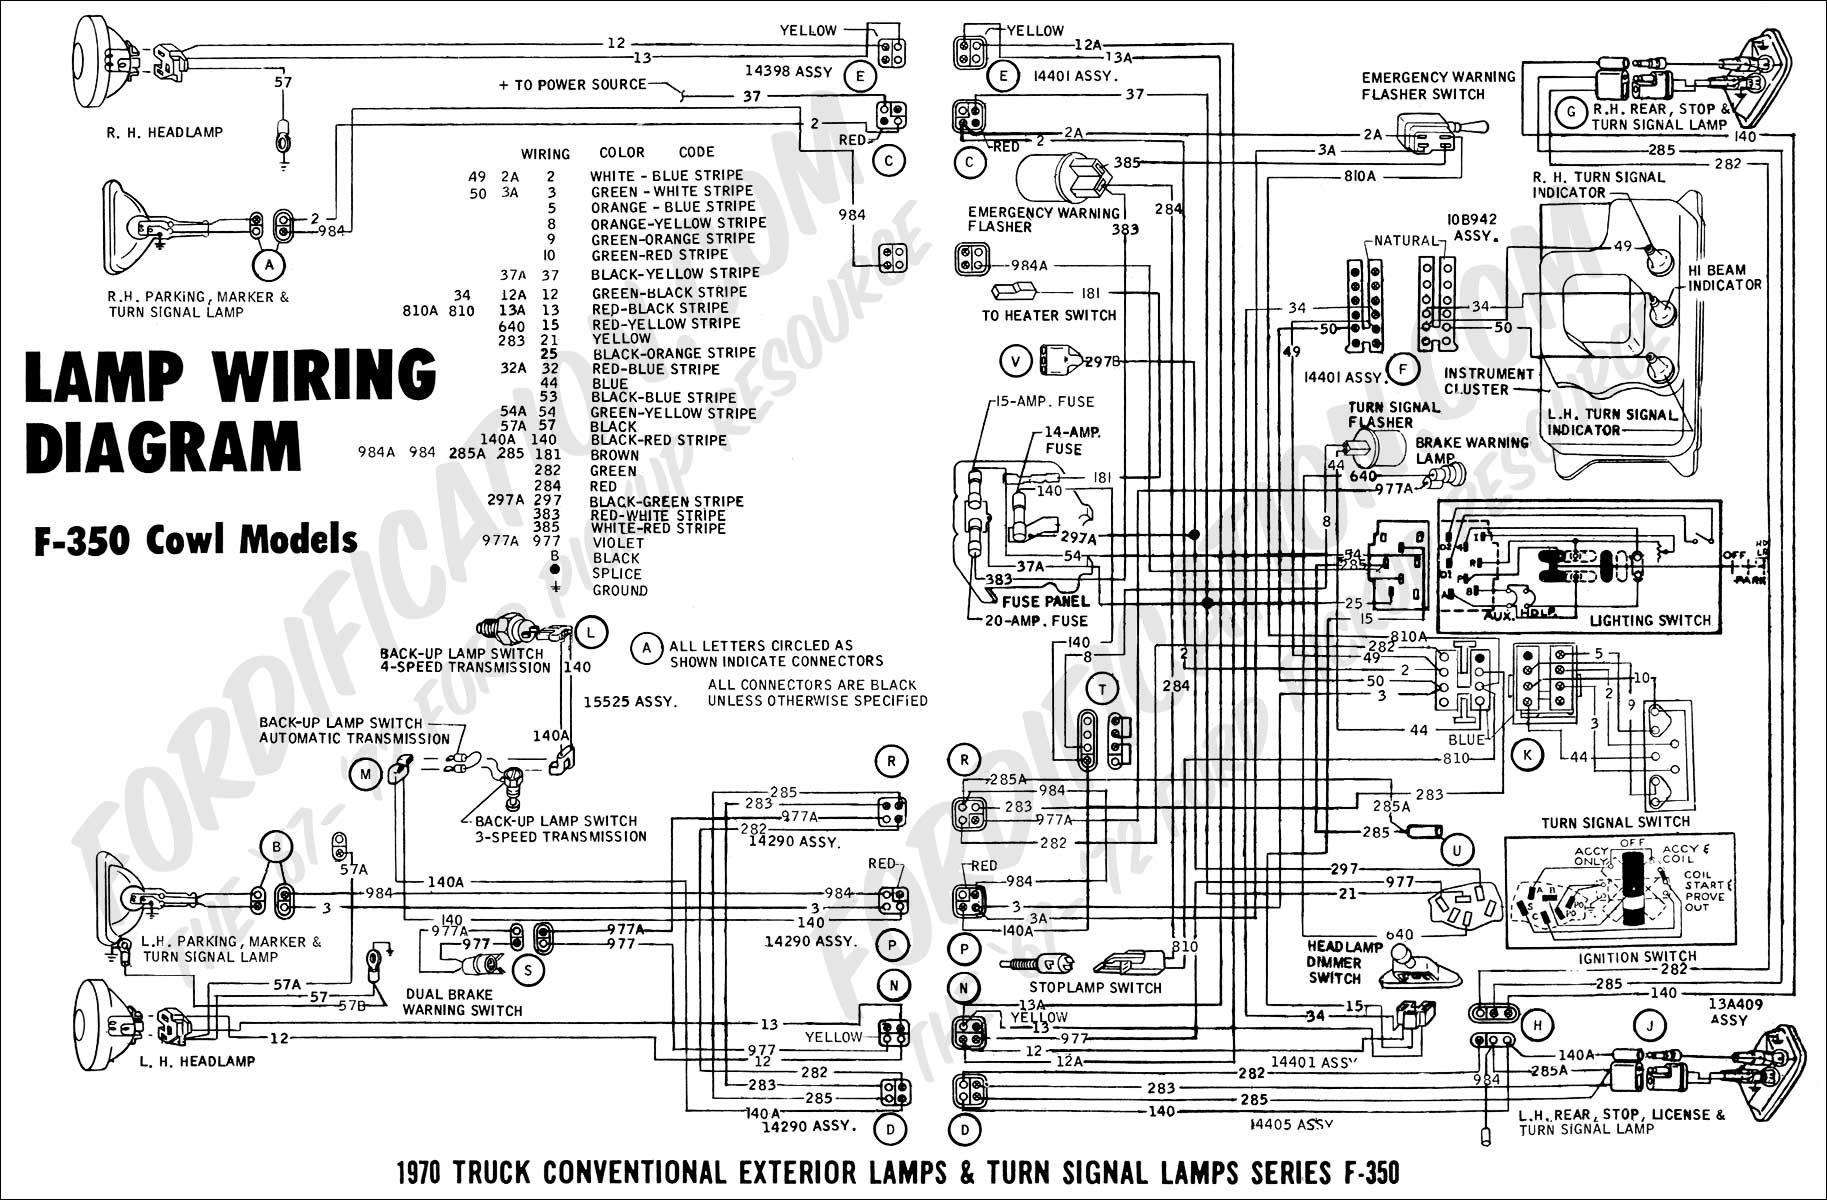 NO_2422] Ford Headlight Switch Wiring Diagram 1997 Ford F 350 Steering  Column Wiring Diagram | Ford F53 Steering Column Wiring Diagram |  | Kook Subc Acion Vira Mohammedshrine Librar Wiring 101